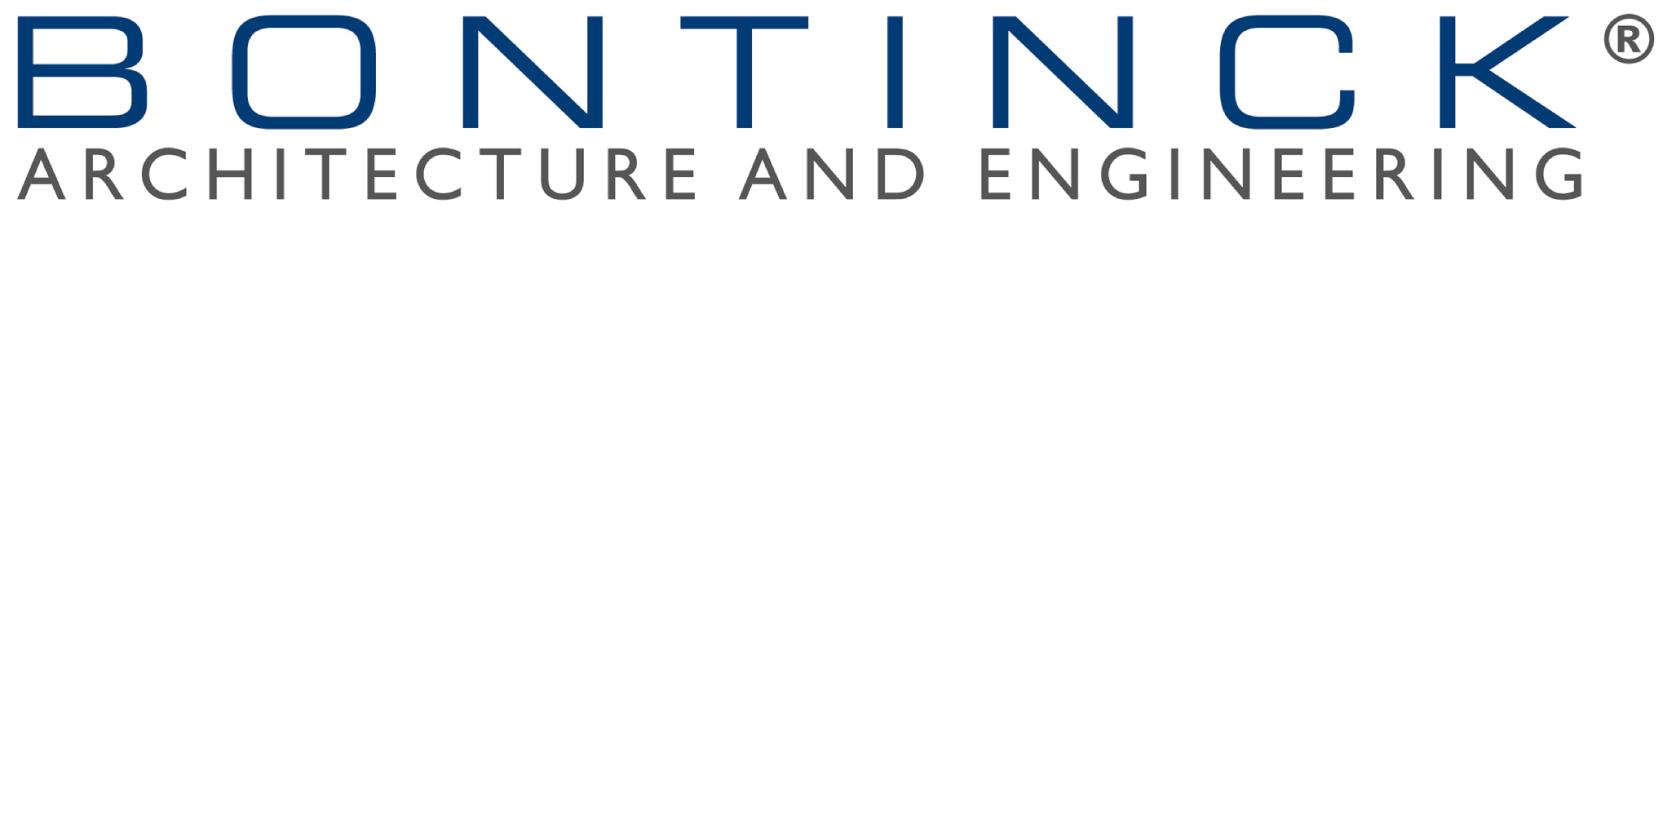 Bontinck Architecture & Engineering